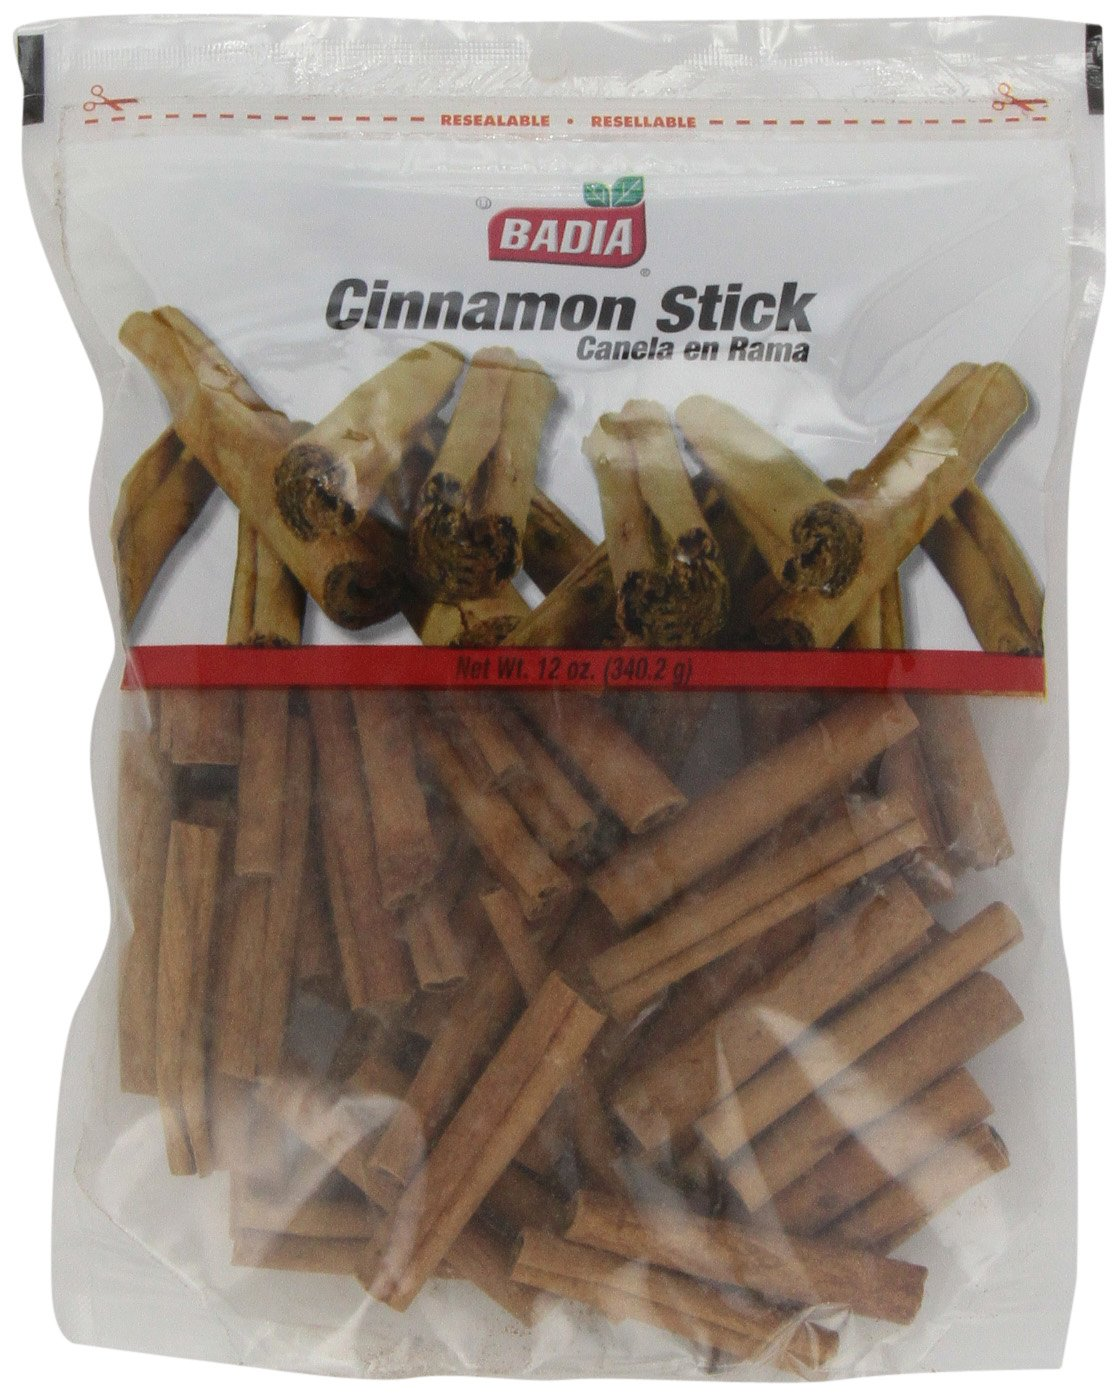 Badia Cinnamon Sticks, 12-Ounce (Pack of 6)